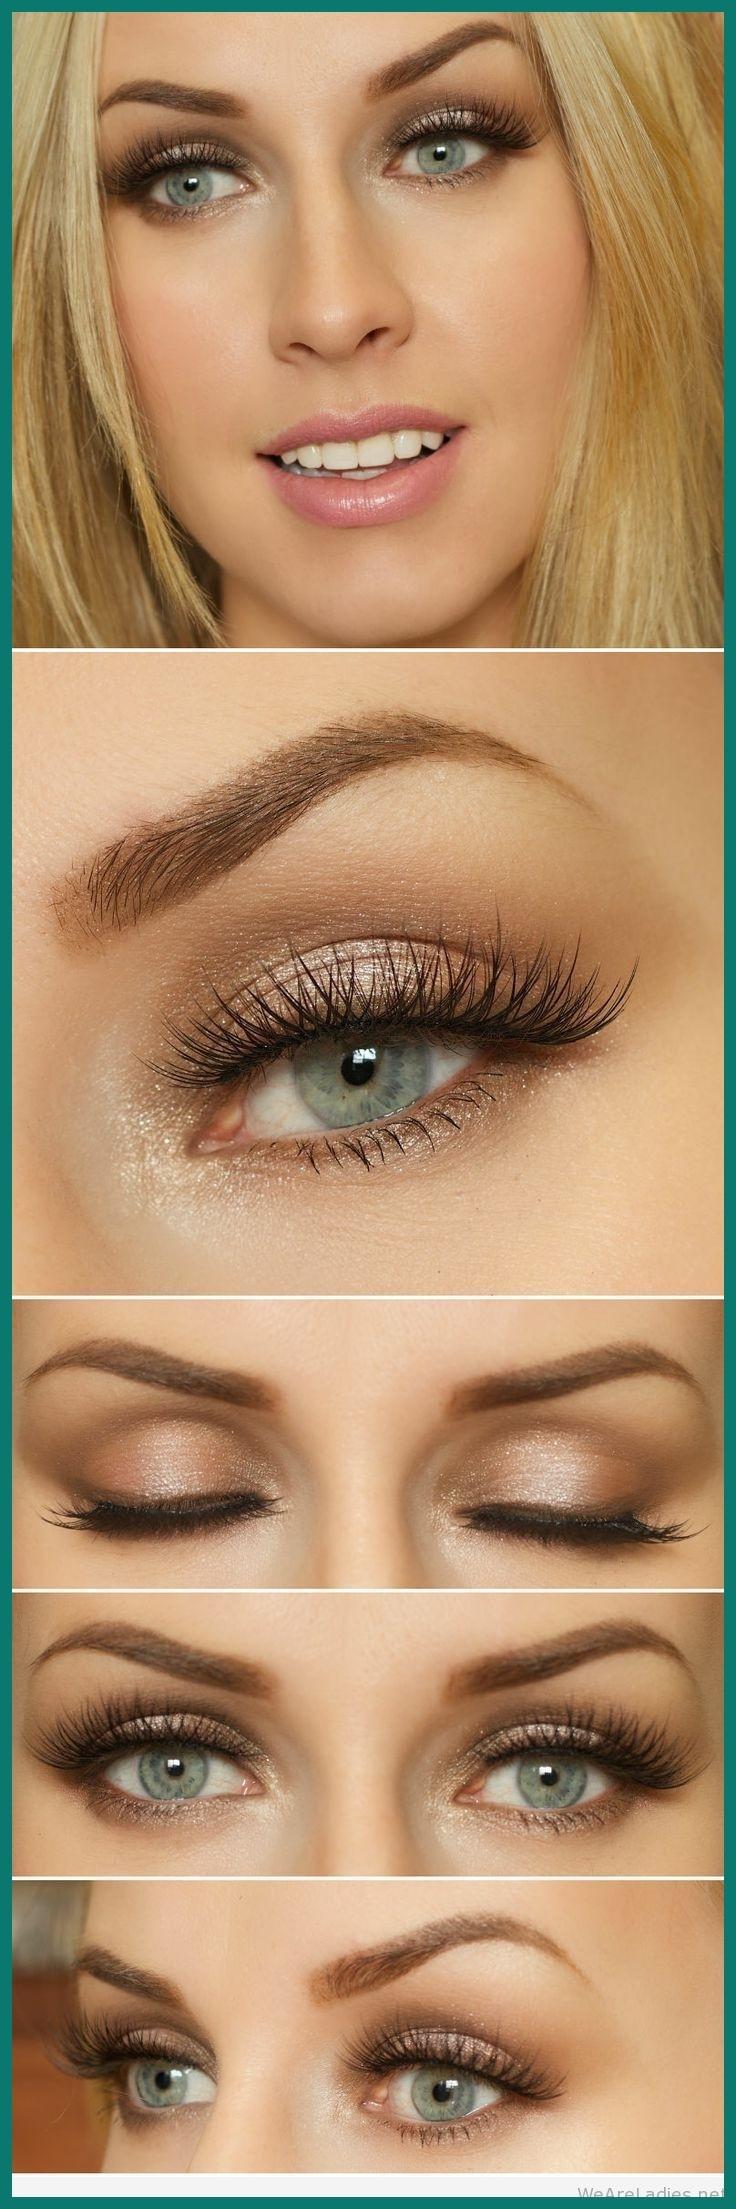 Eyeshadow Colors For Blue Eyes And Blonde Hair 100179 with Best Eyeshadow Color For Blue Green Eyes And Blonde Hair